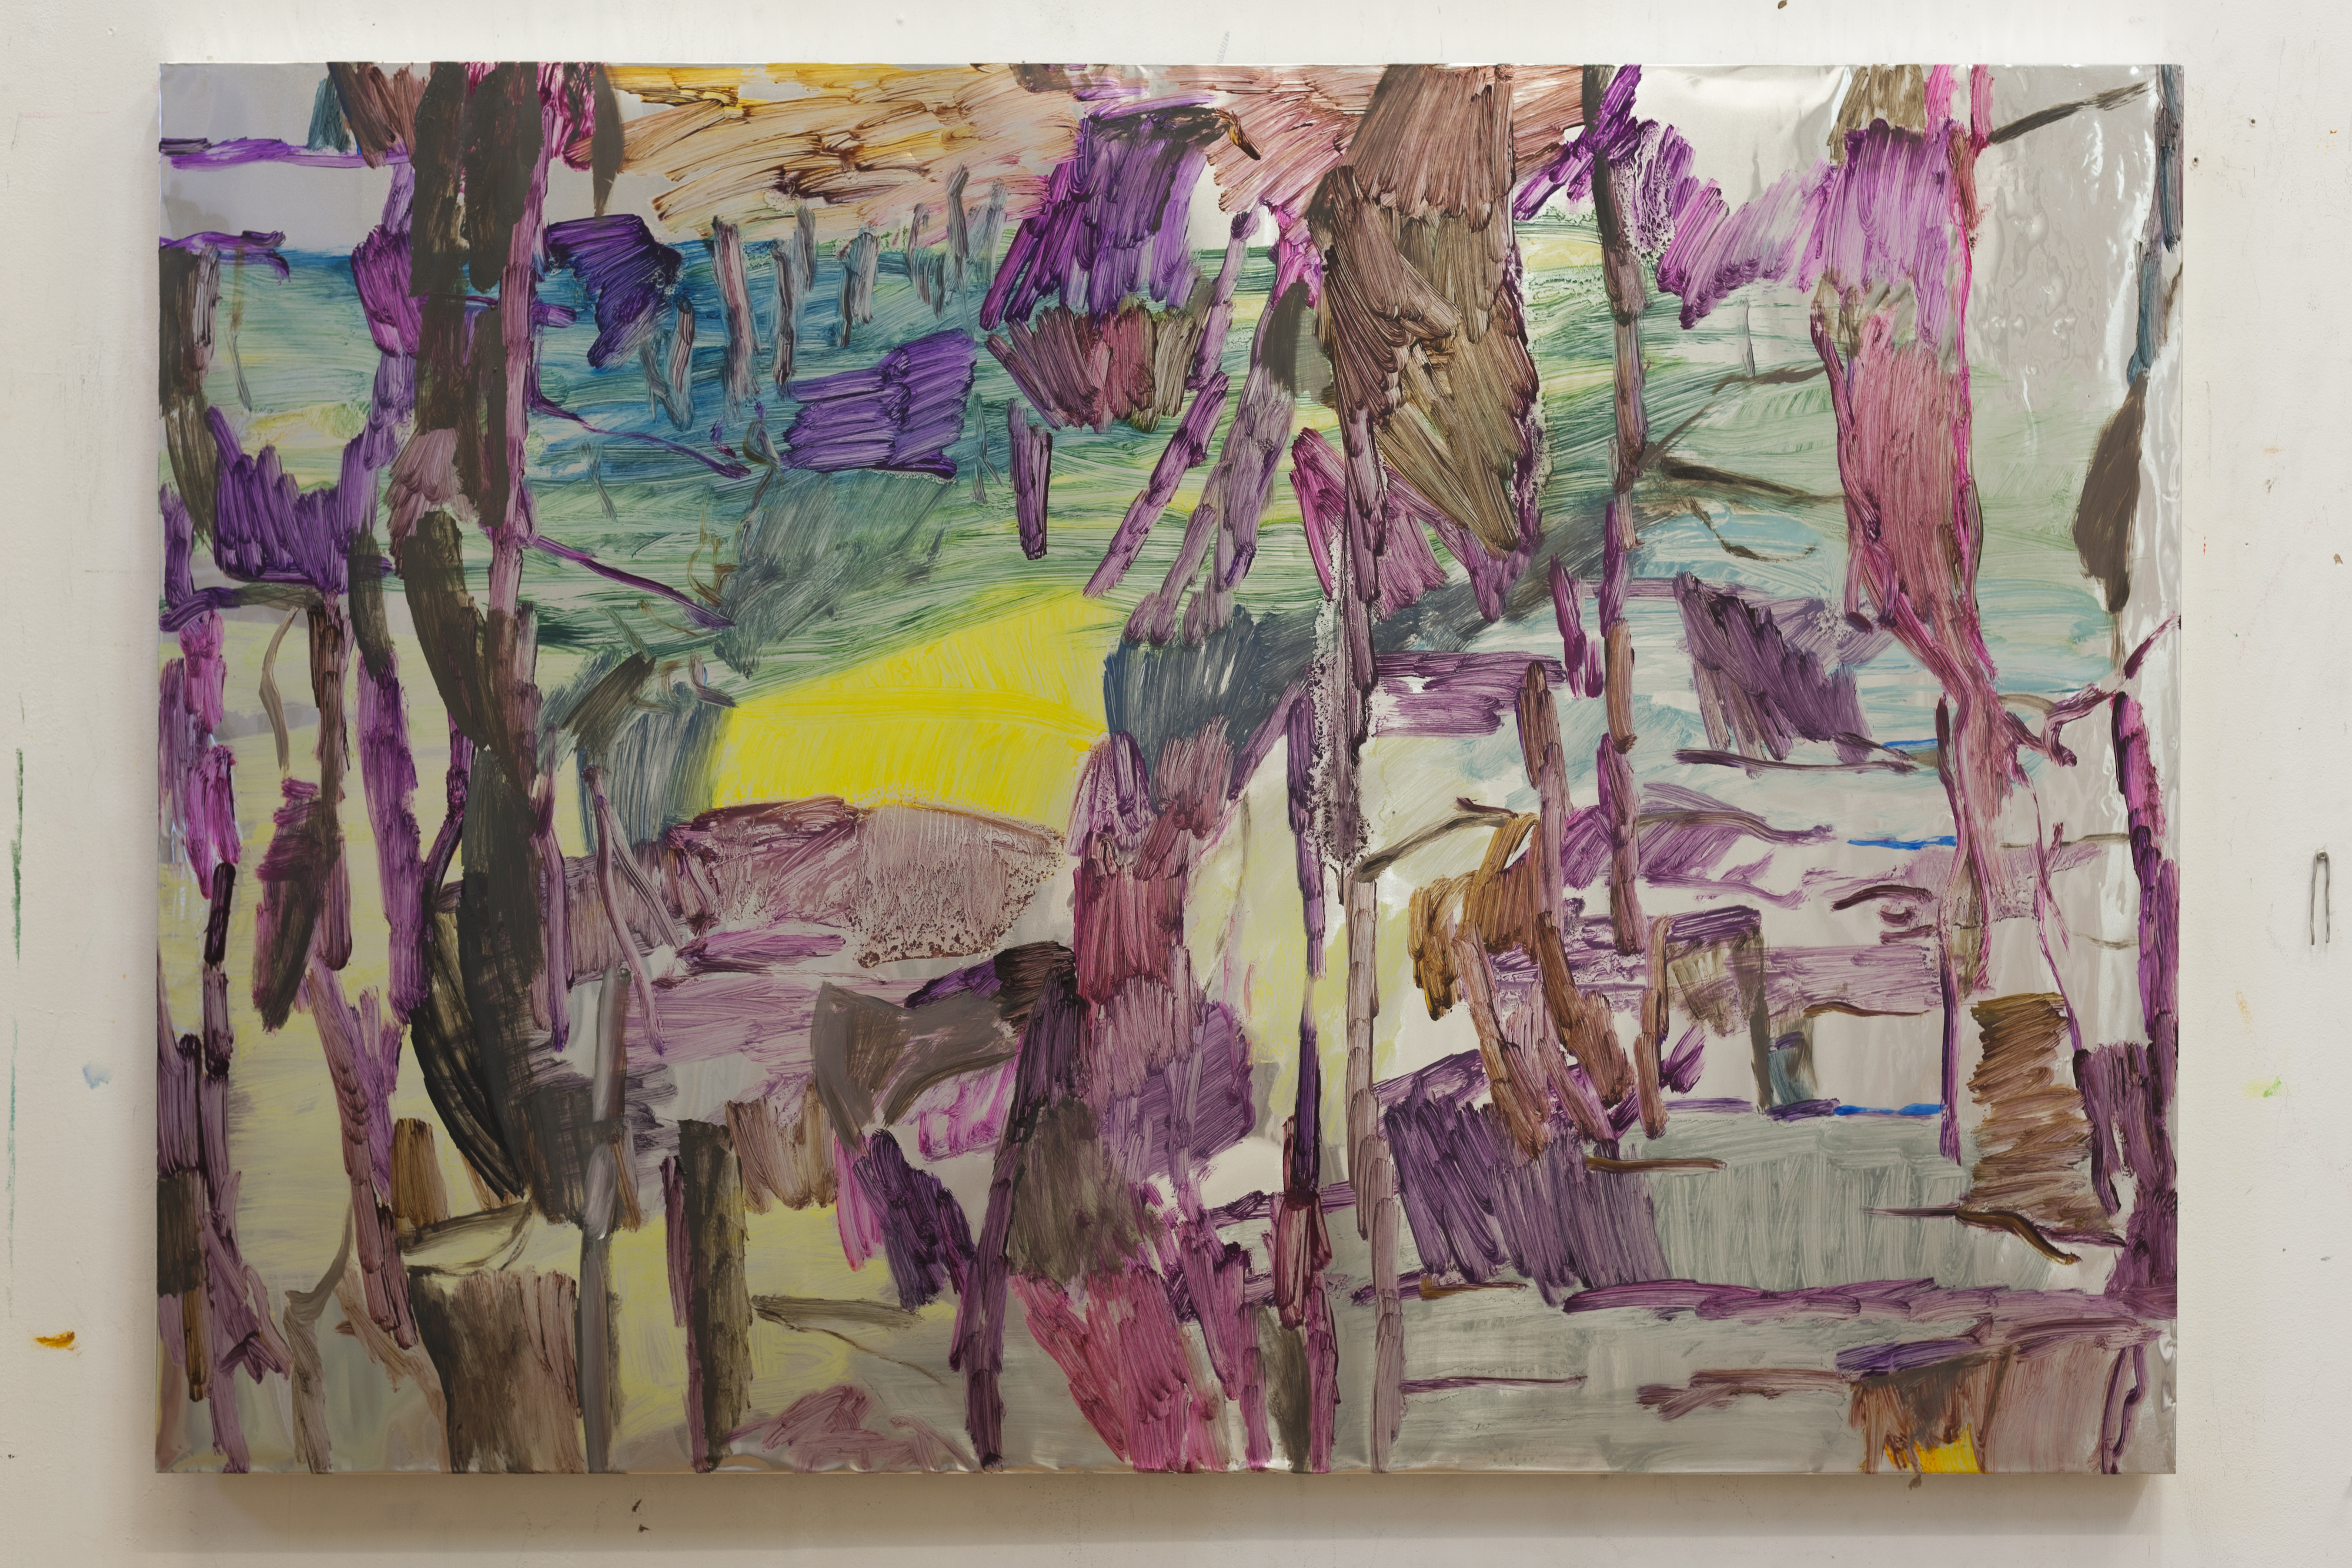 Henrik Eriksson, Utan titel (dhs 12), 2018 Oil on aluminium, 85 x 122 cm